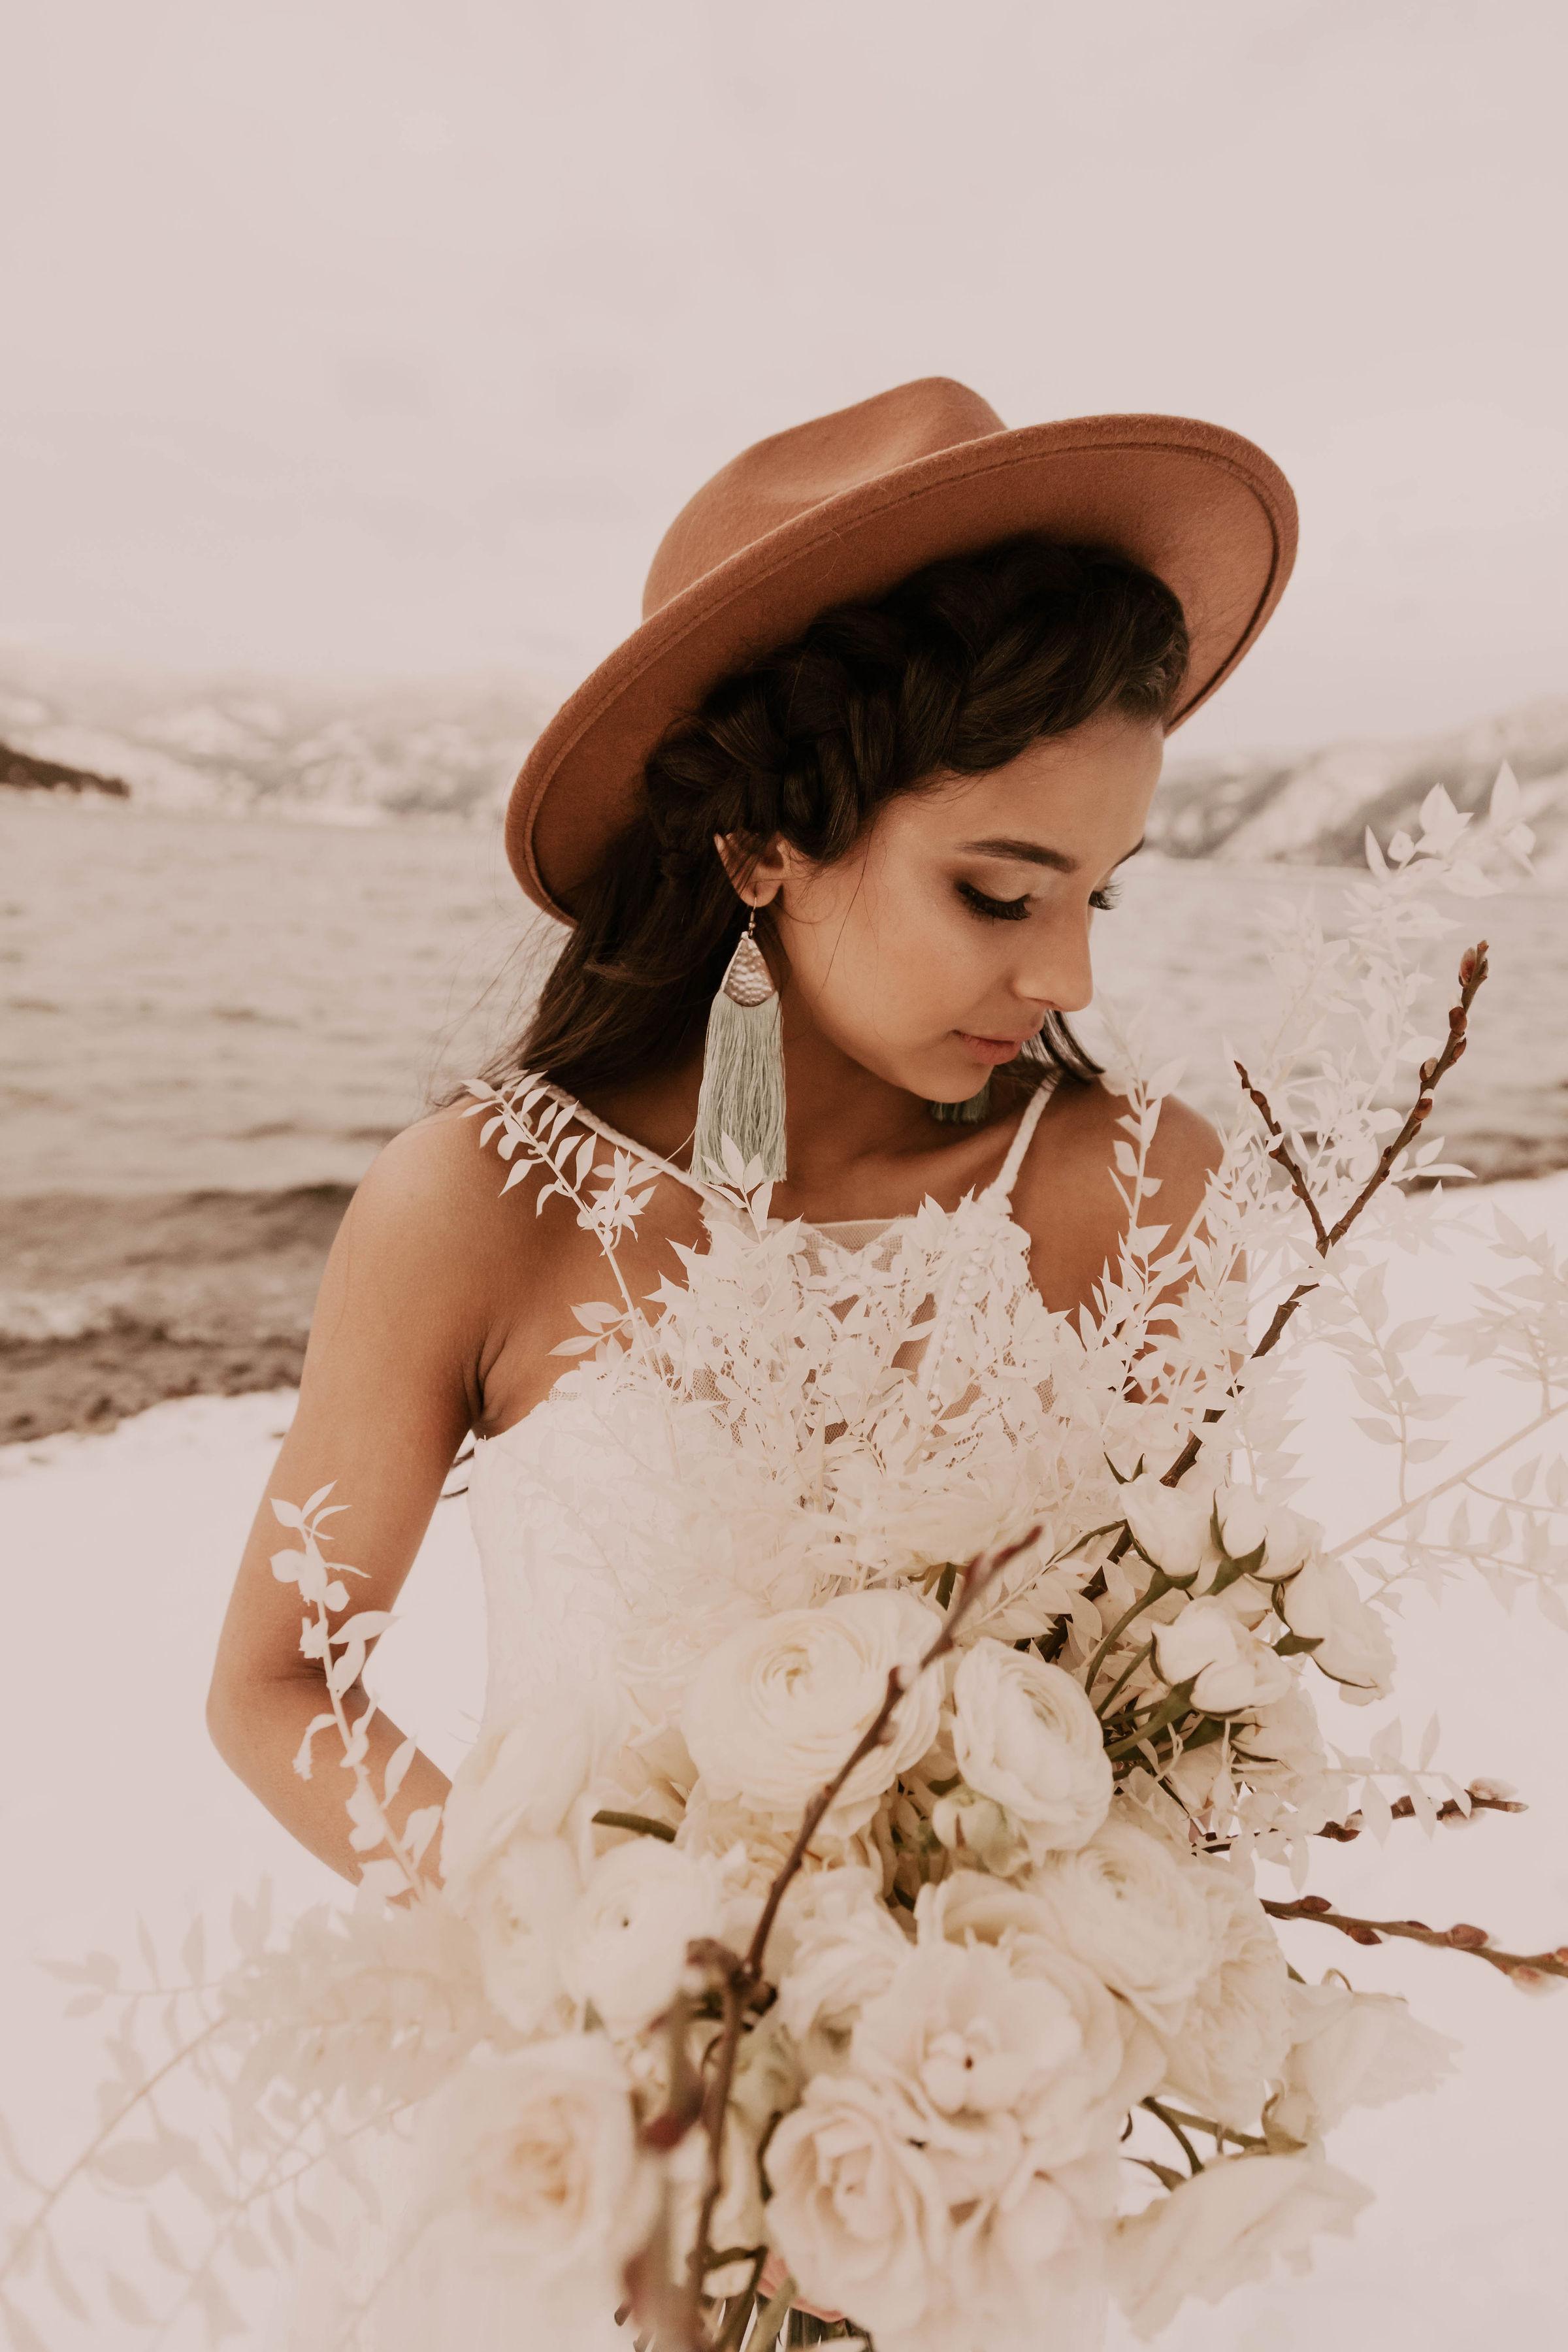 winter bride spokane in brown hat